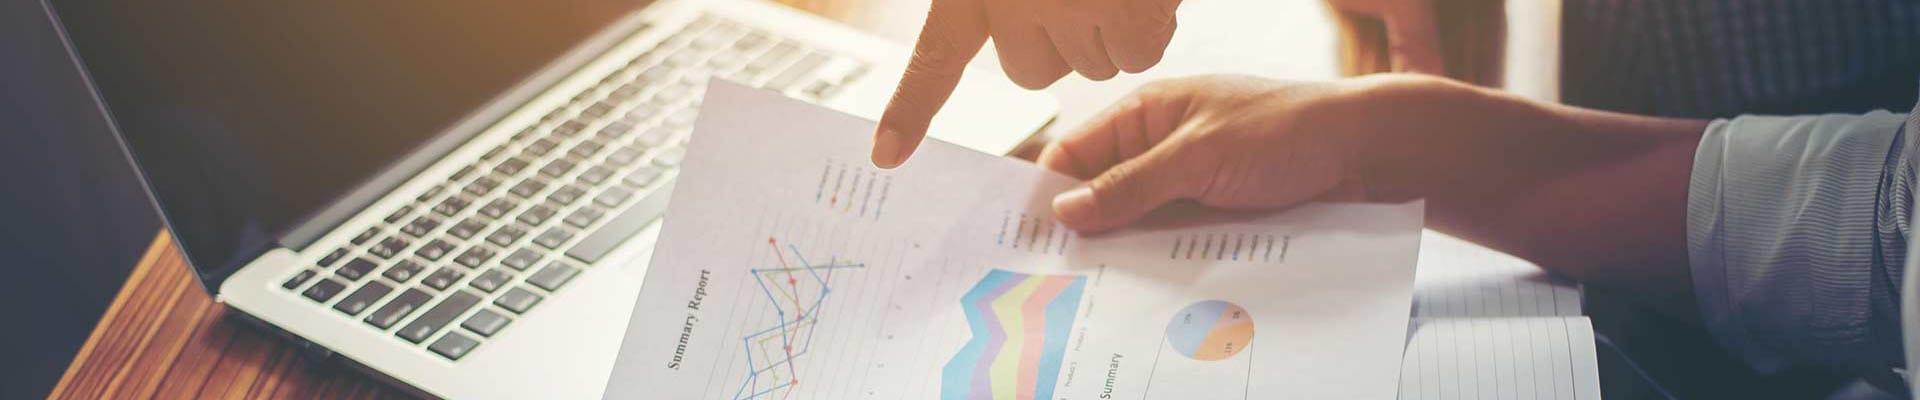 EdgeVerve-Analyst-Reports